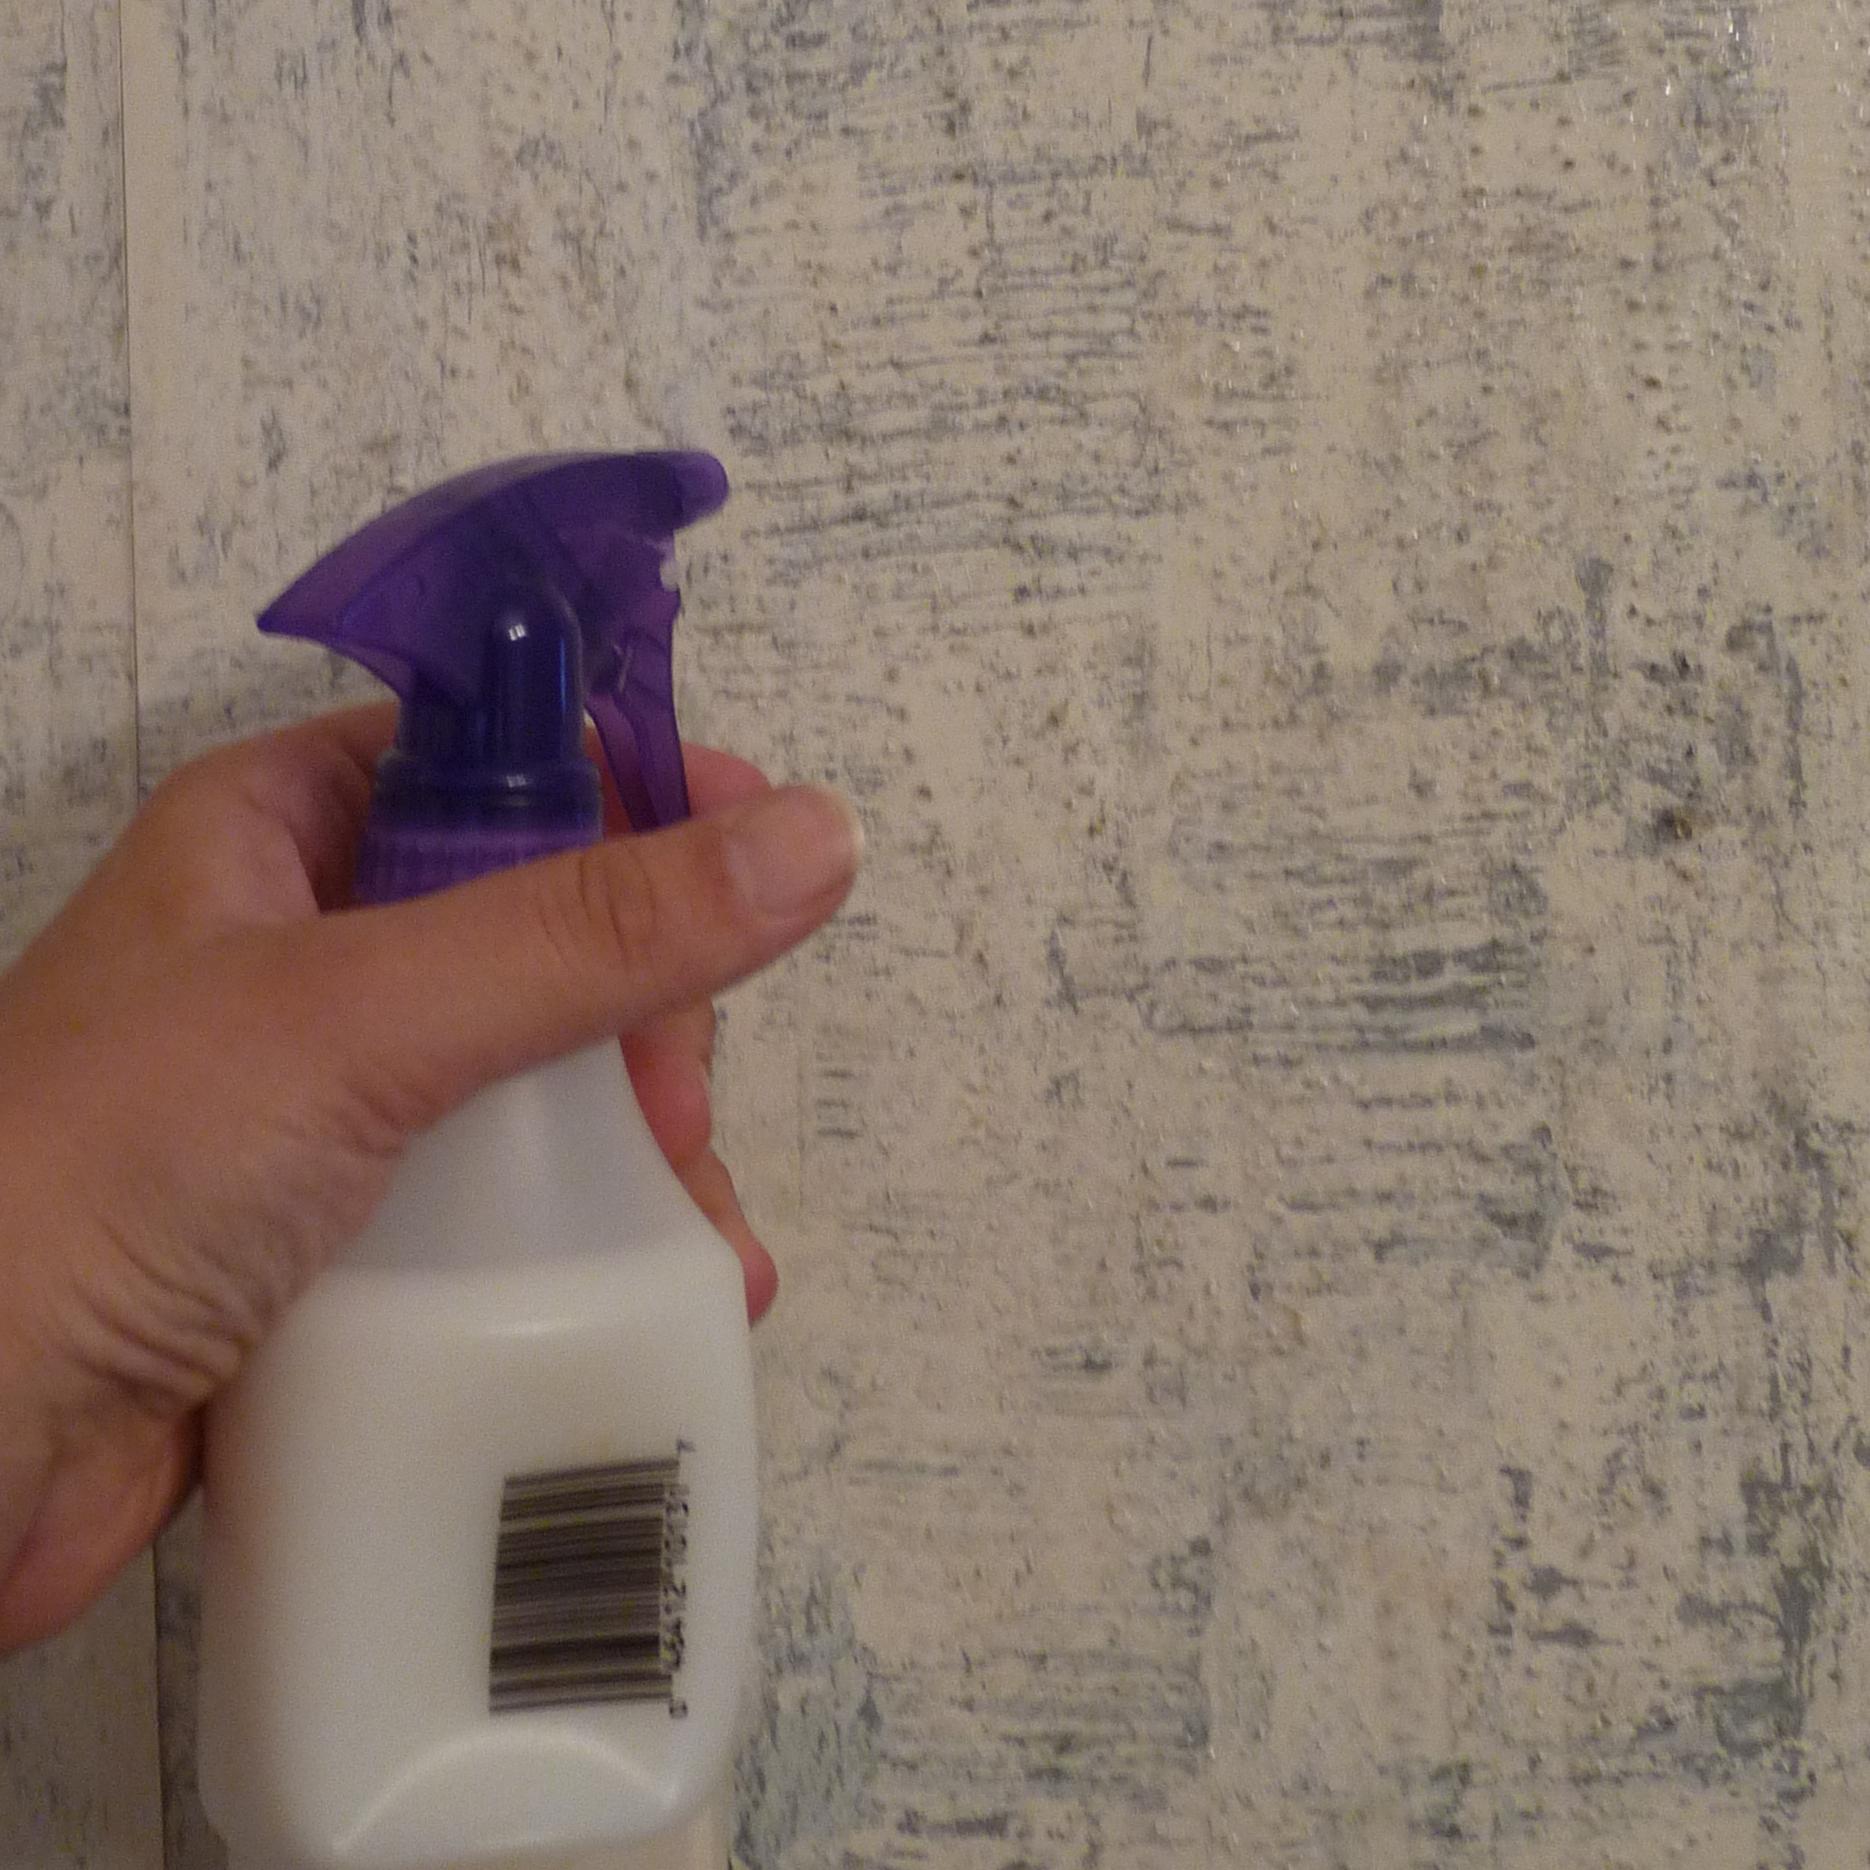 Free Download Removing Wallpaper Glue Hd Photo Wallpaper